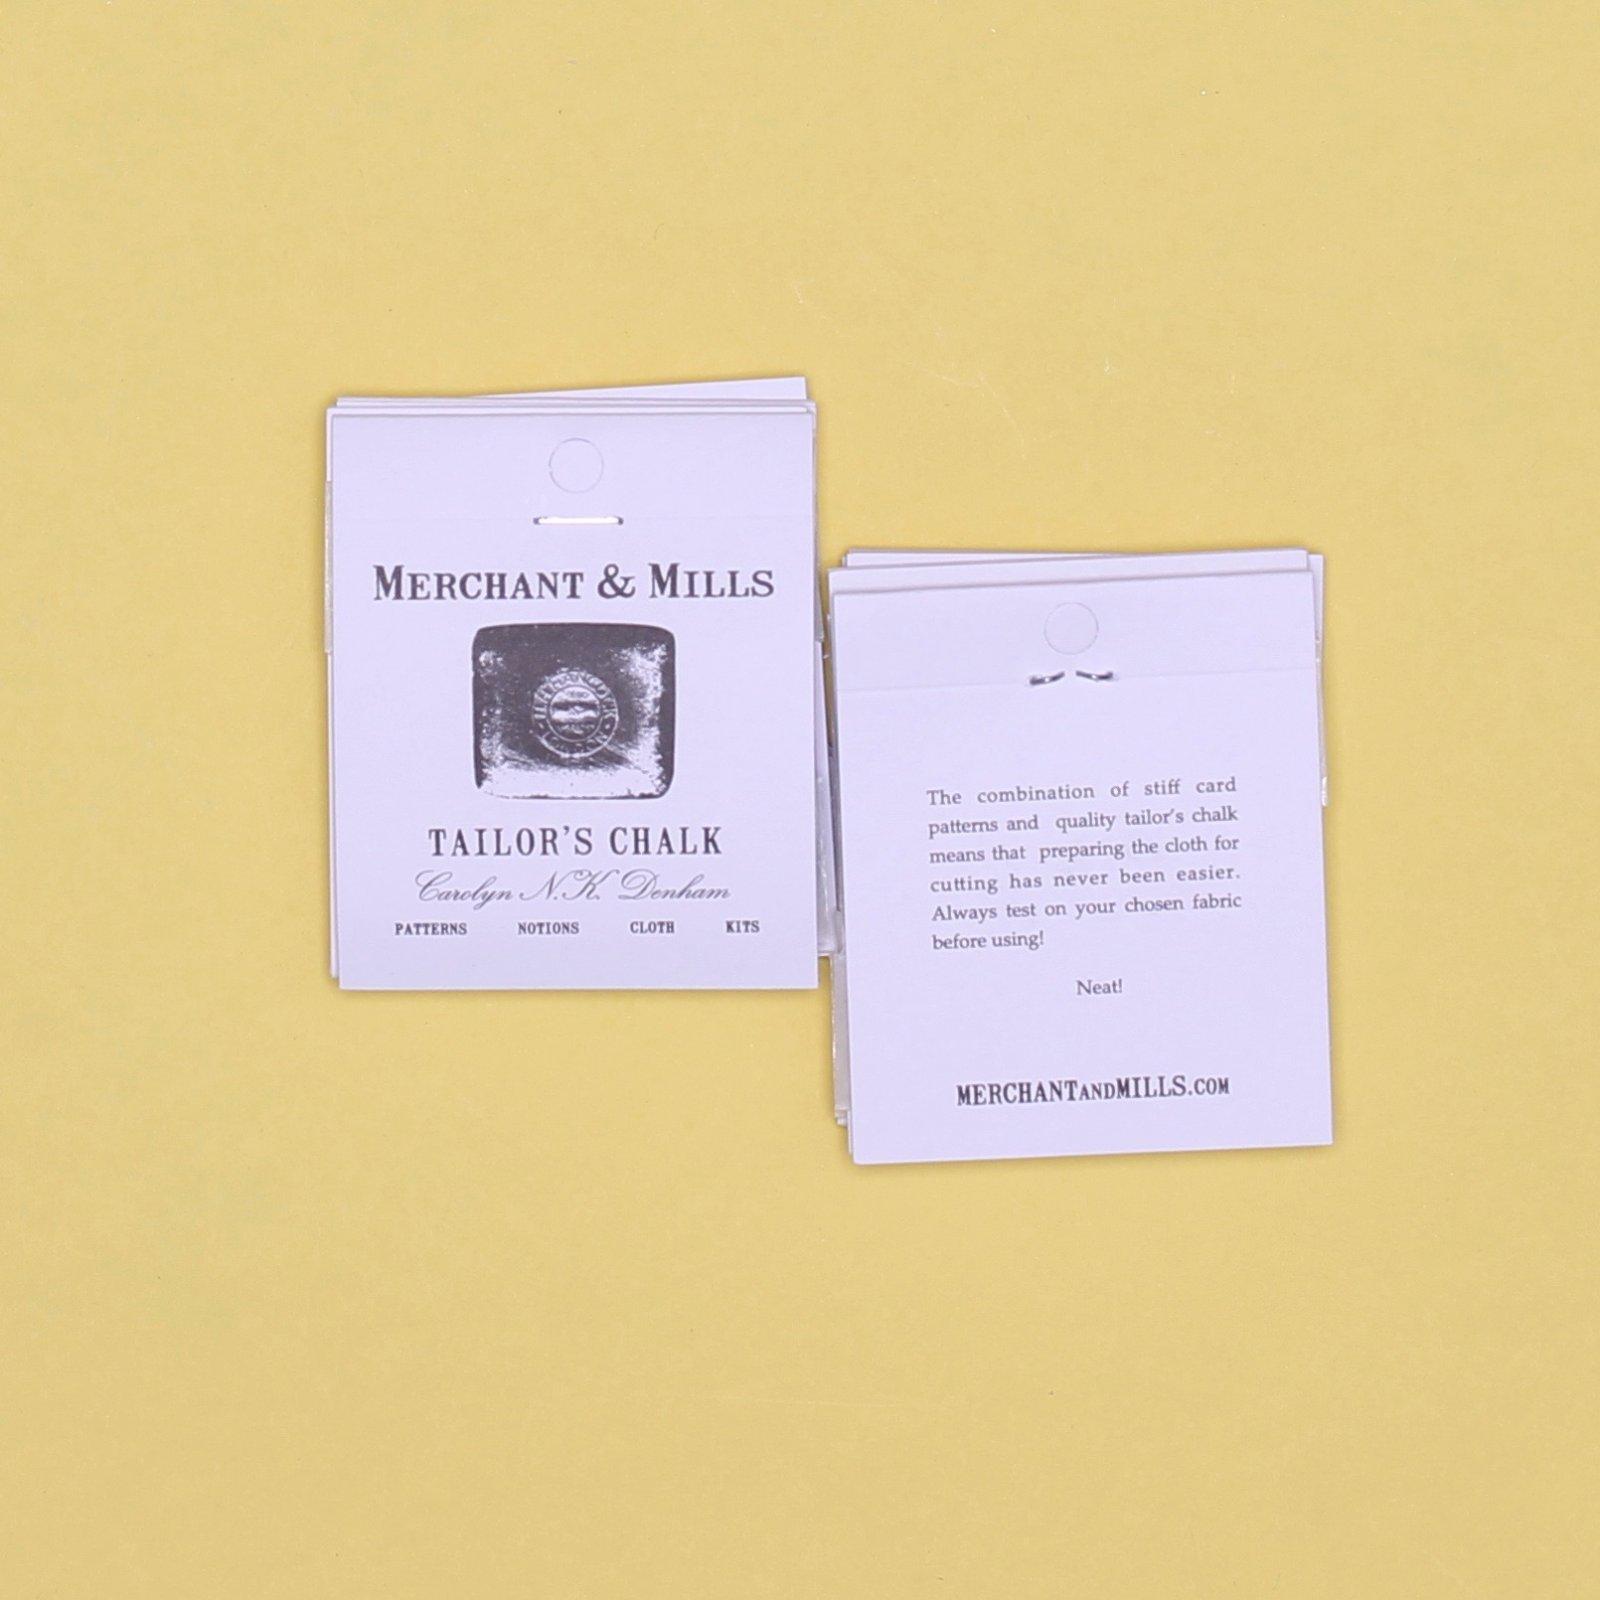 Merchant Mills Tailor's Chalk